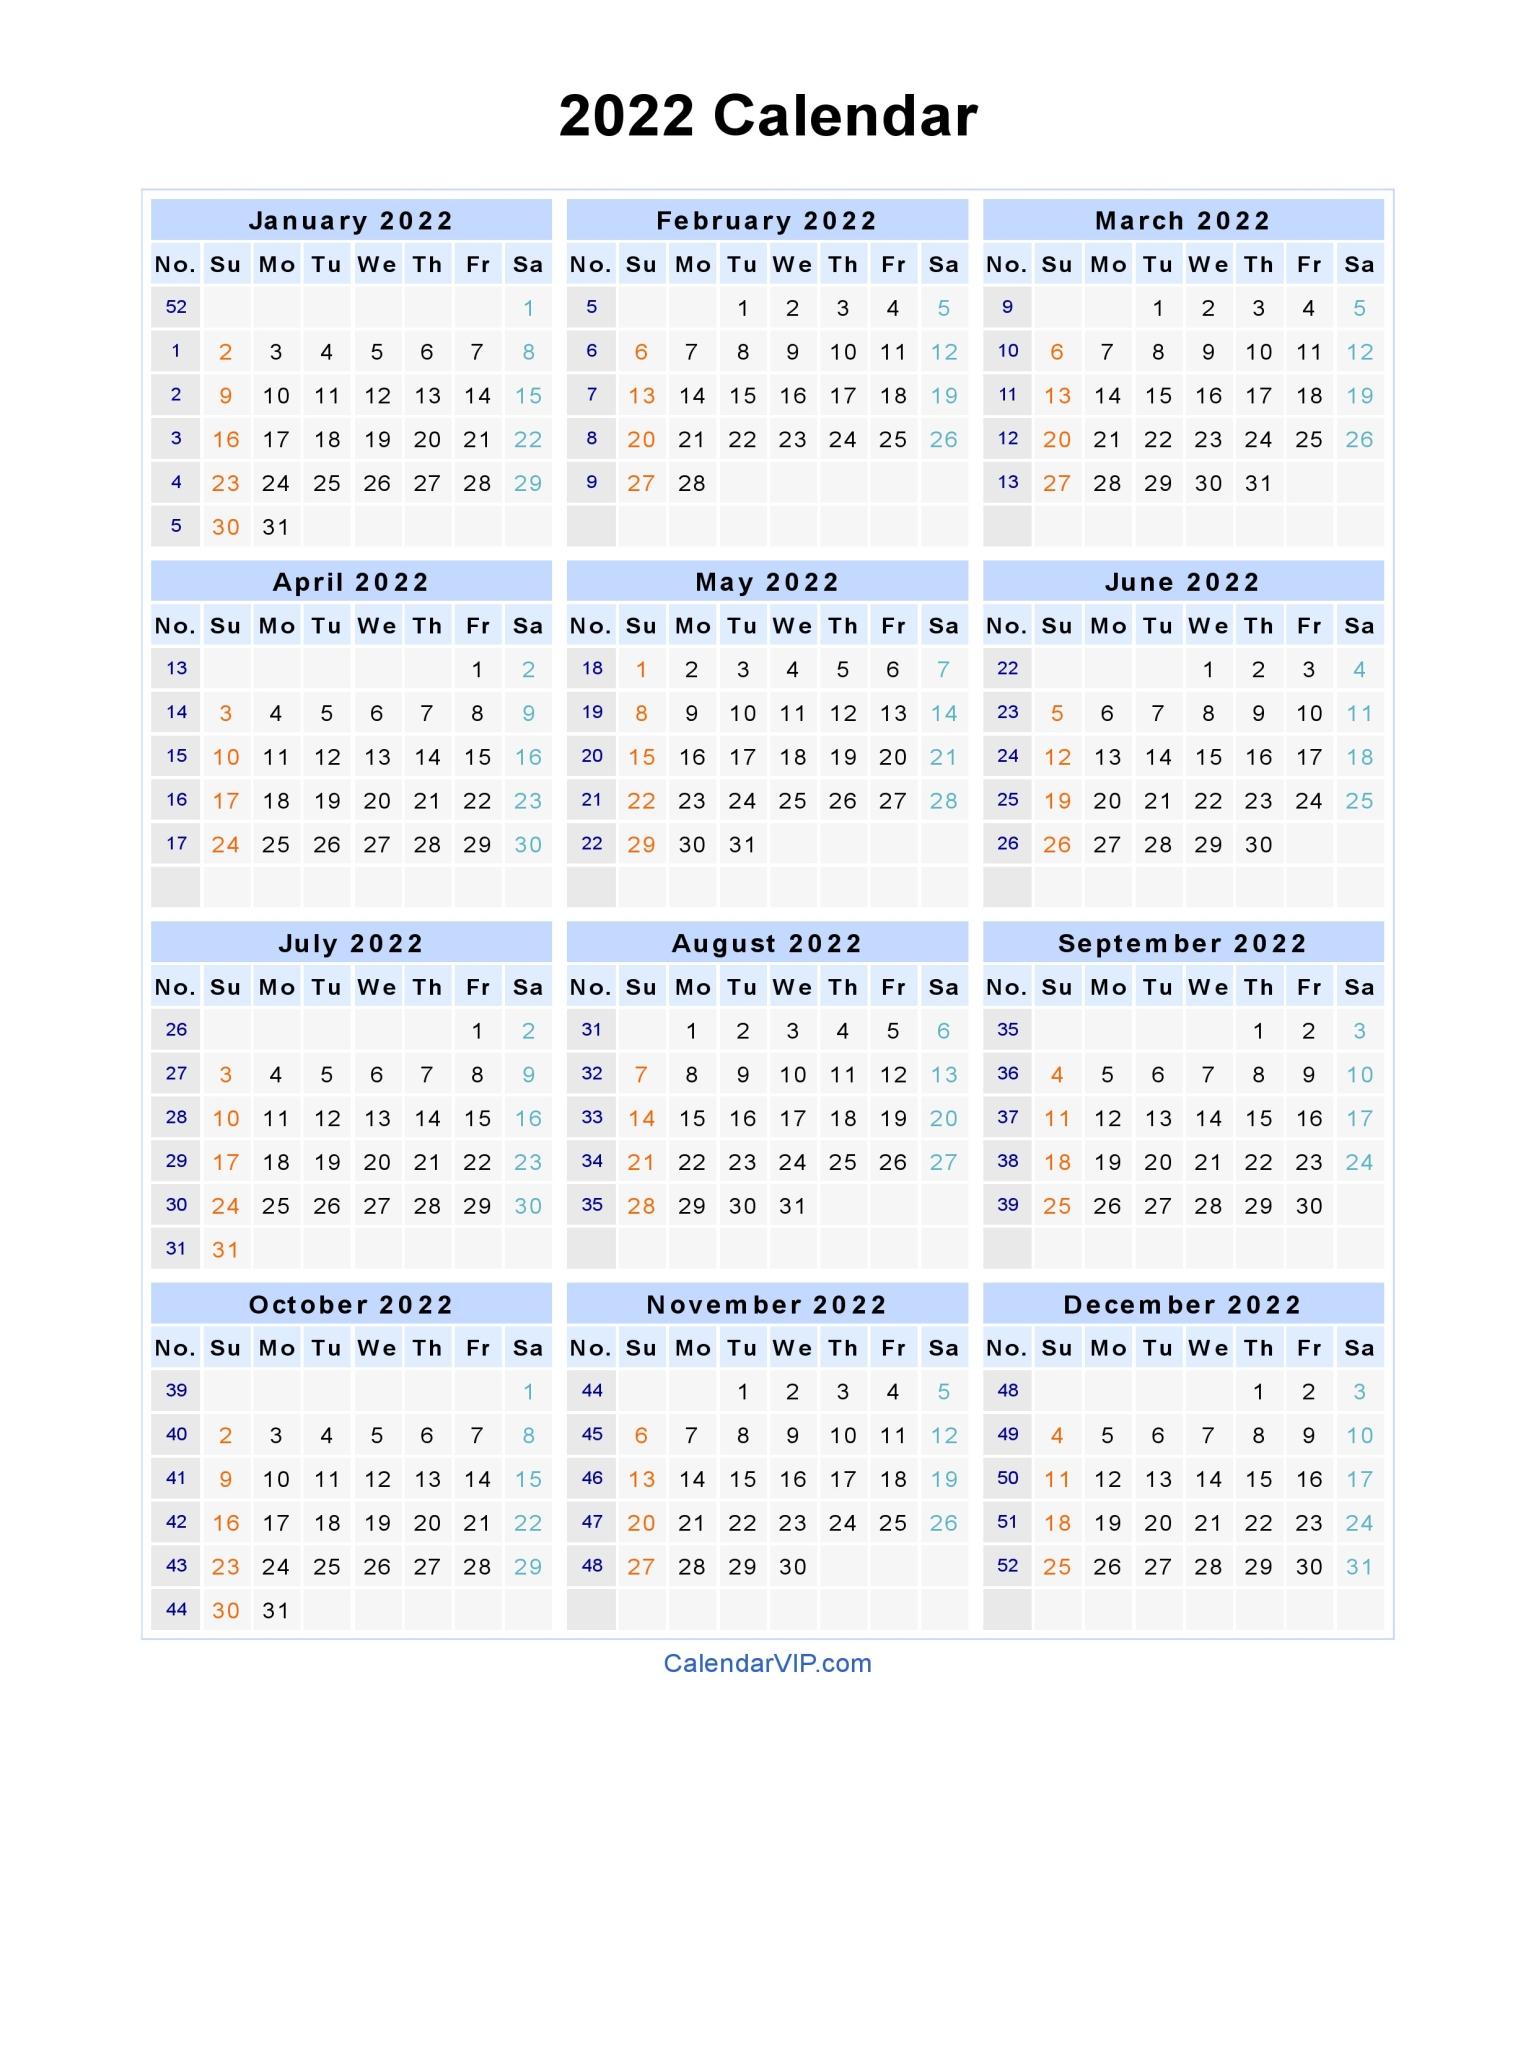 2022 Calendar - Blank Printable Calendar Template In Pdf Word Excel with regard to Blank Year Long Calendar 2022